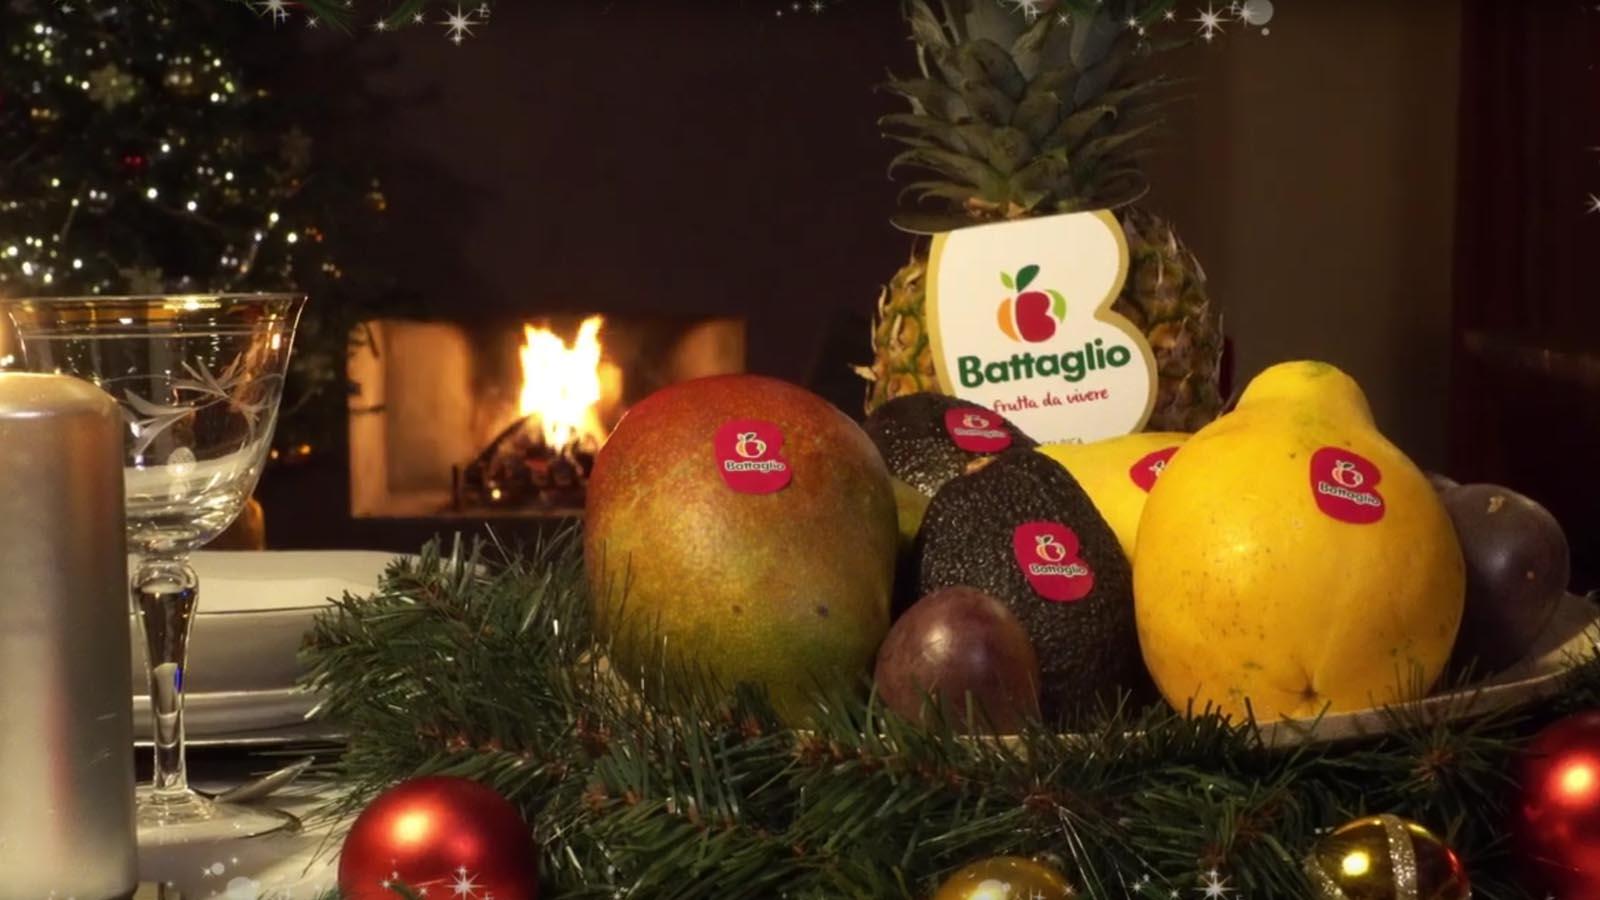 Fruitfulxmas - Battaglio Spa